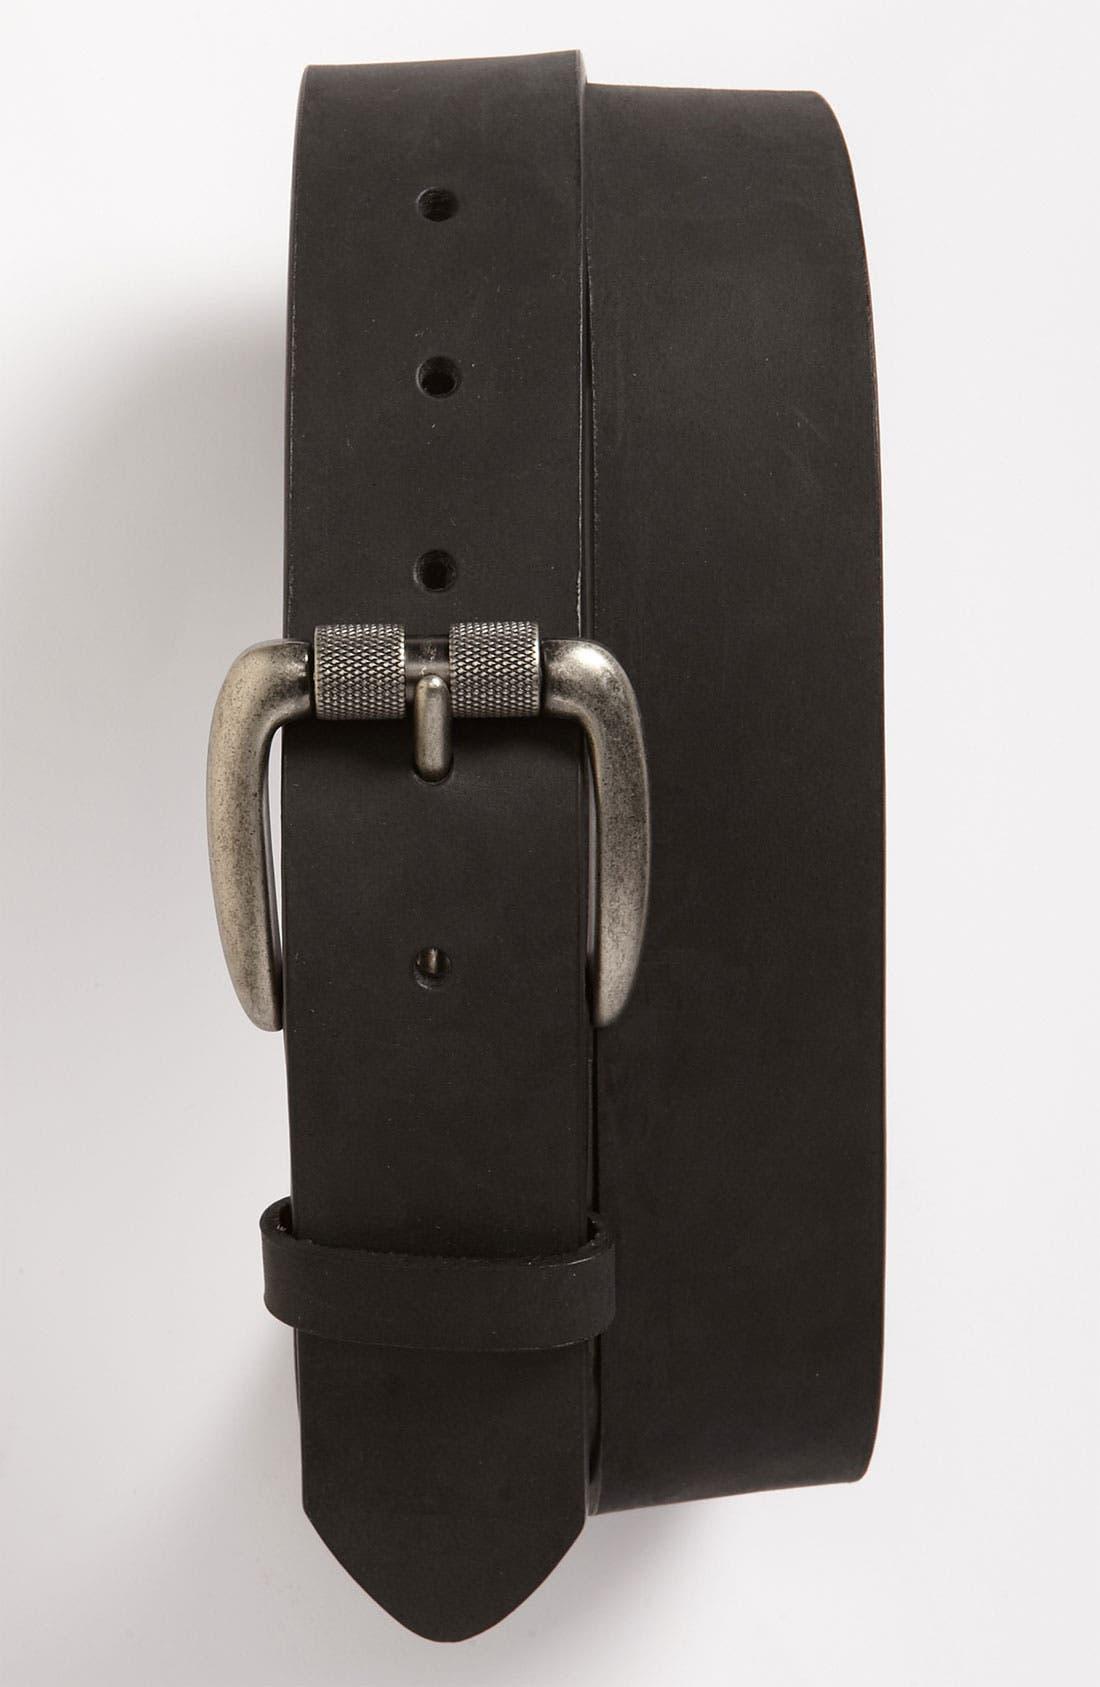 Main Image - Bill Adler 1981 Nubuck Leather Belt